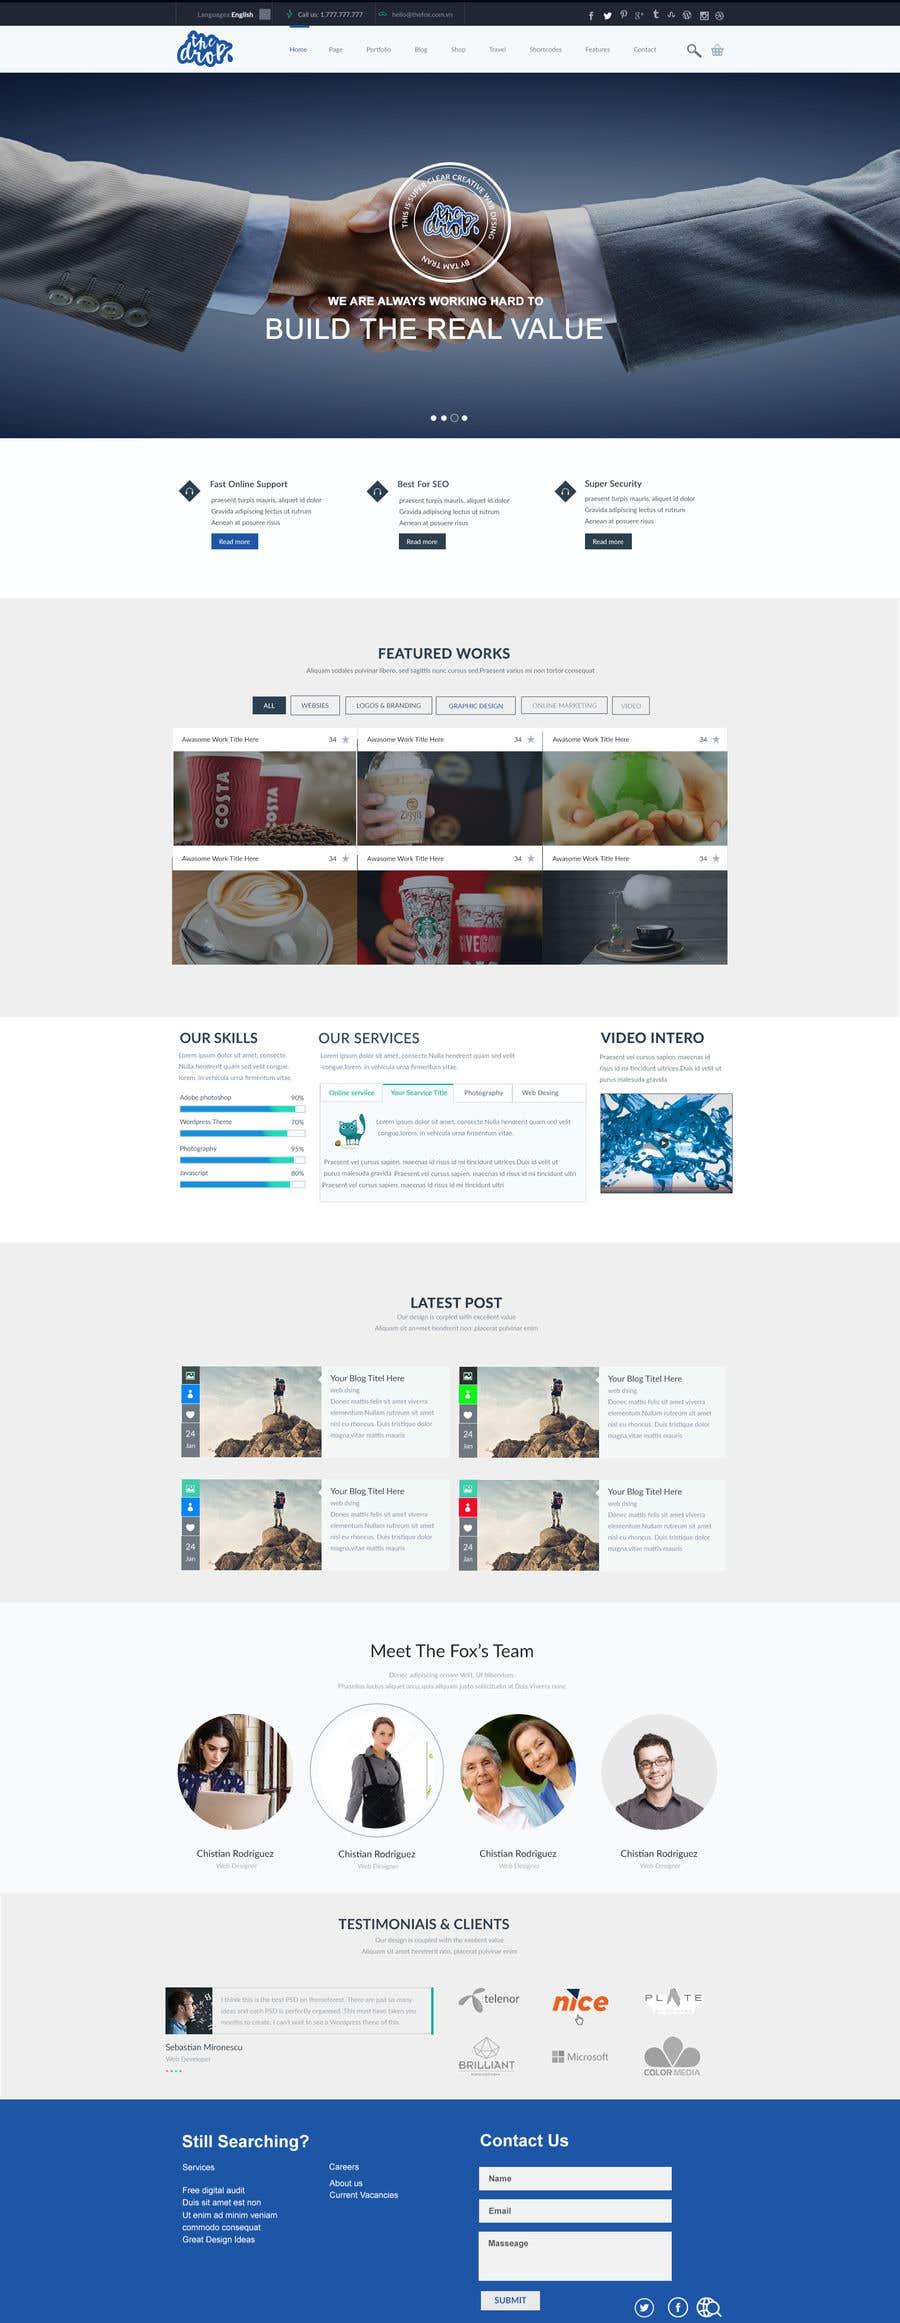 Bài tham dự cuộc thi #27 cho Redesign our main web page